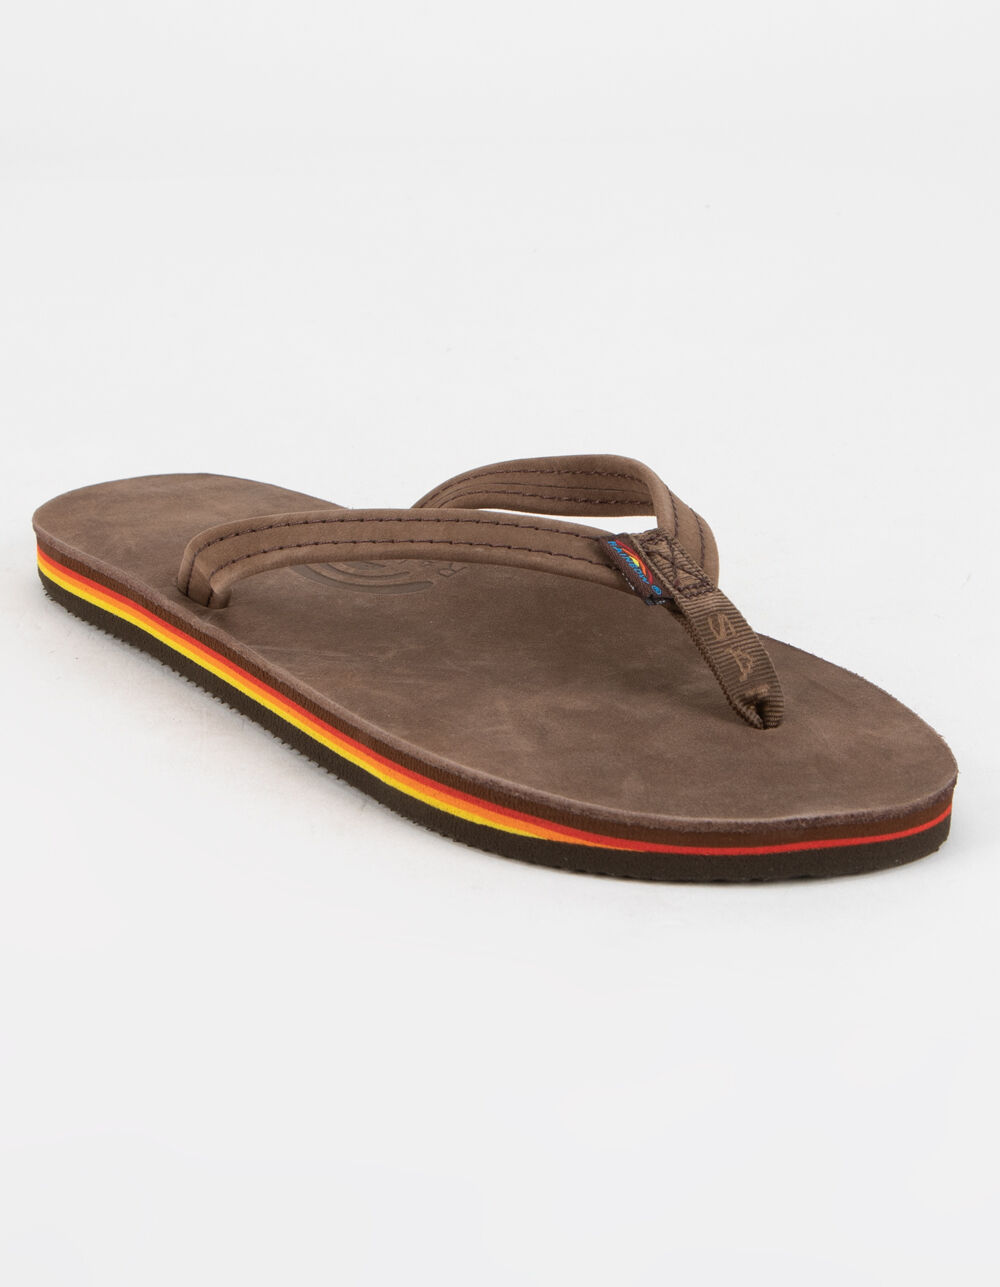 RAINBOW Narrow Strap Sandals